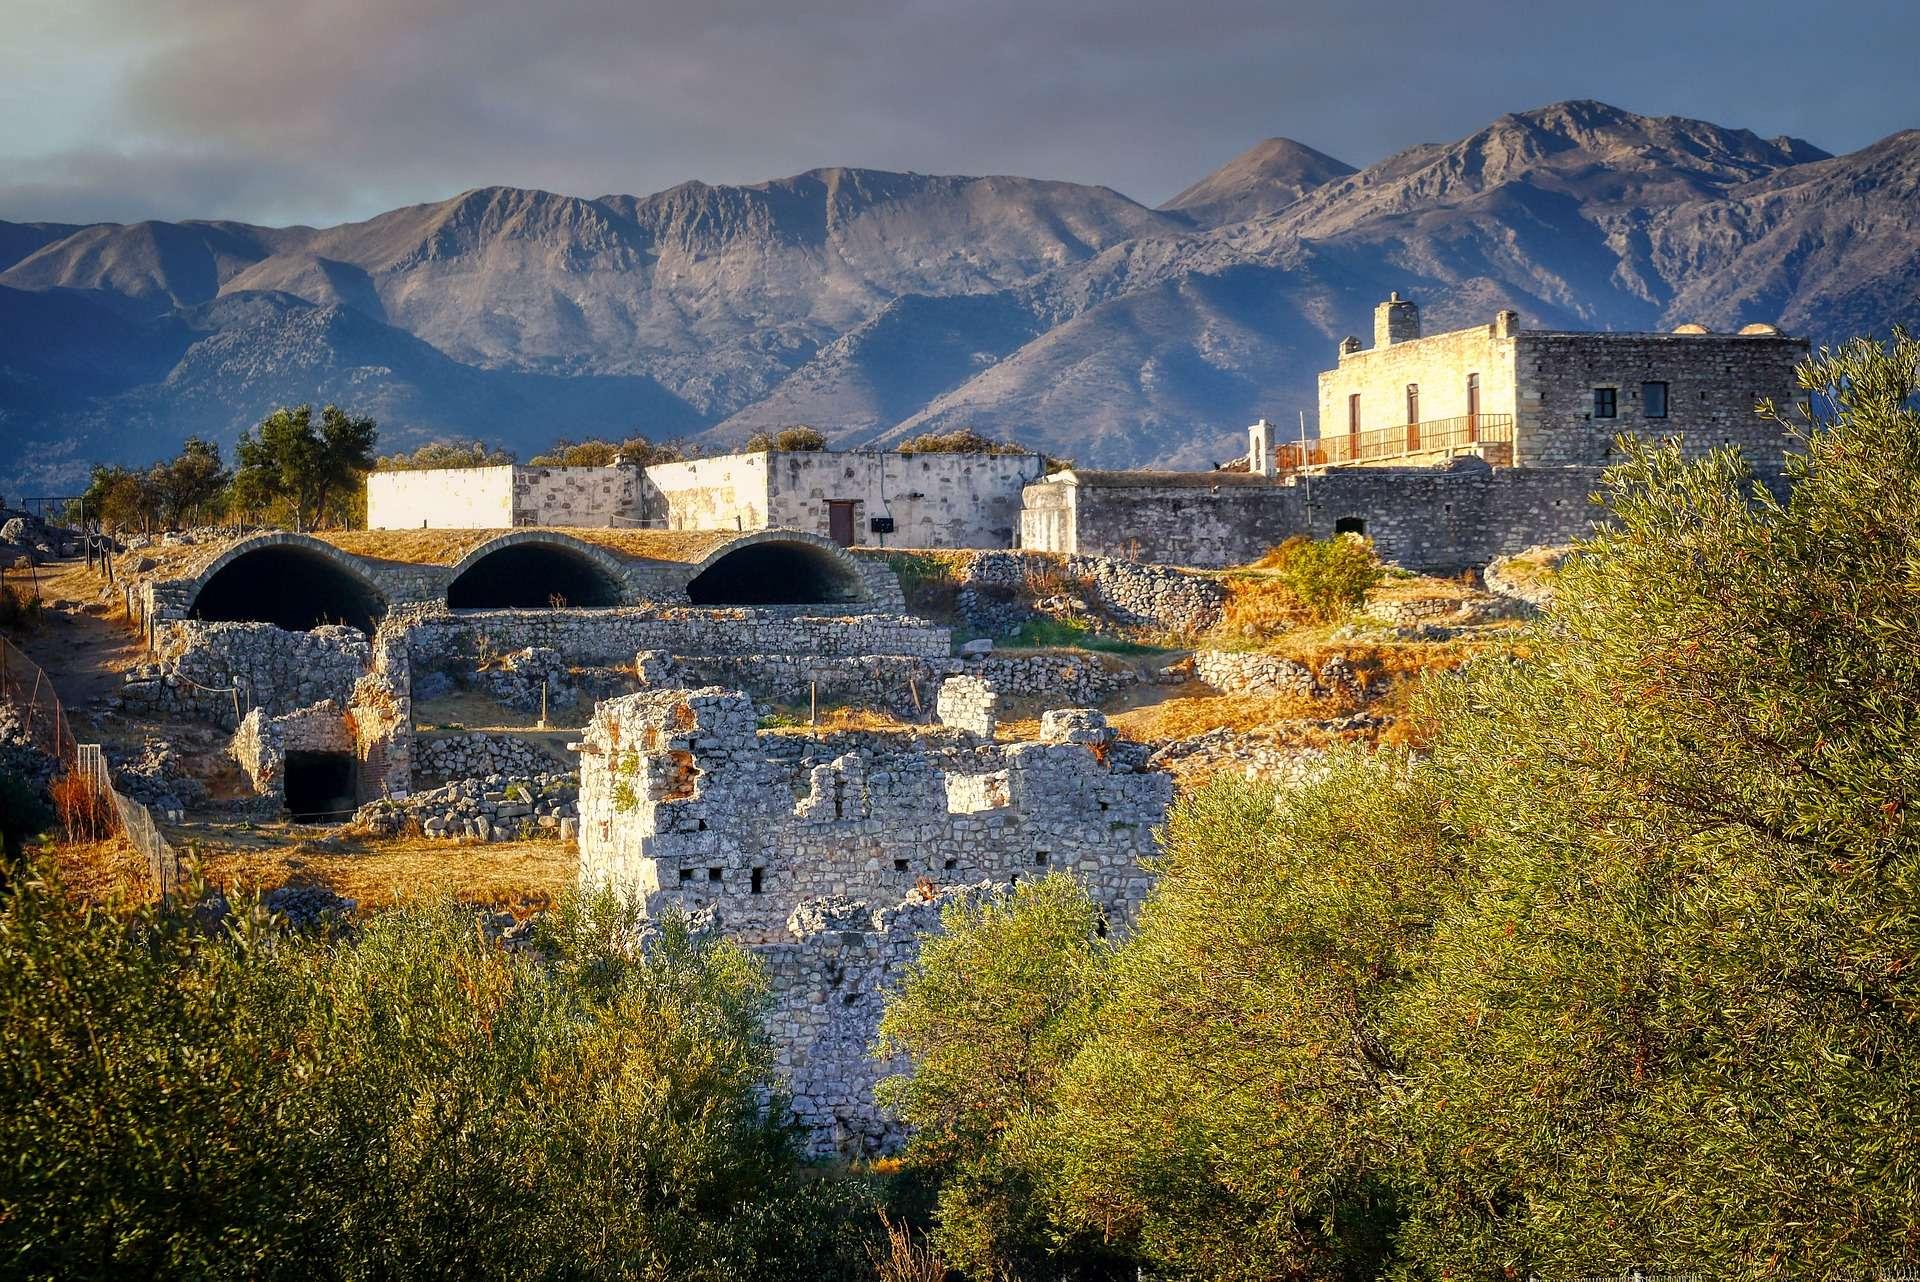 Paysages de Crète. © Albrecht Fietz, Pixabay